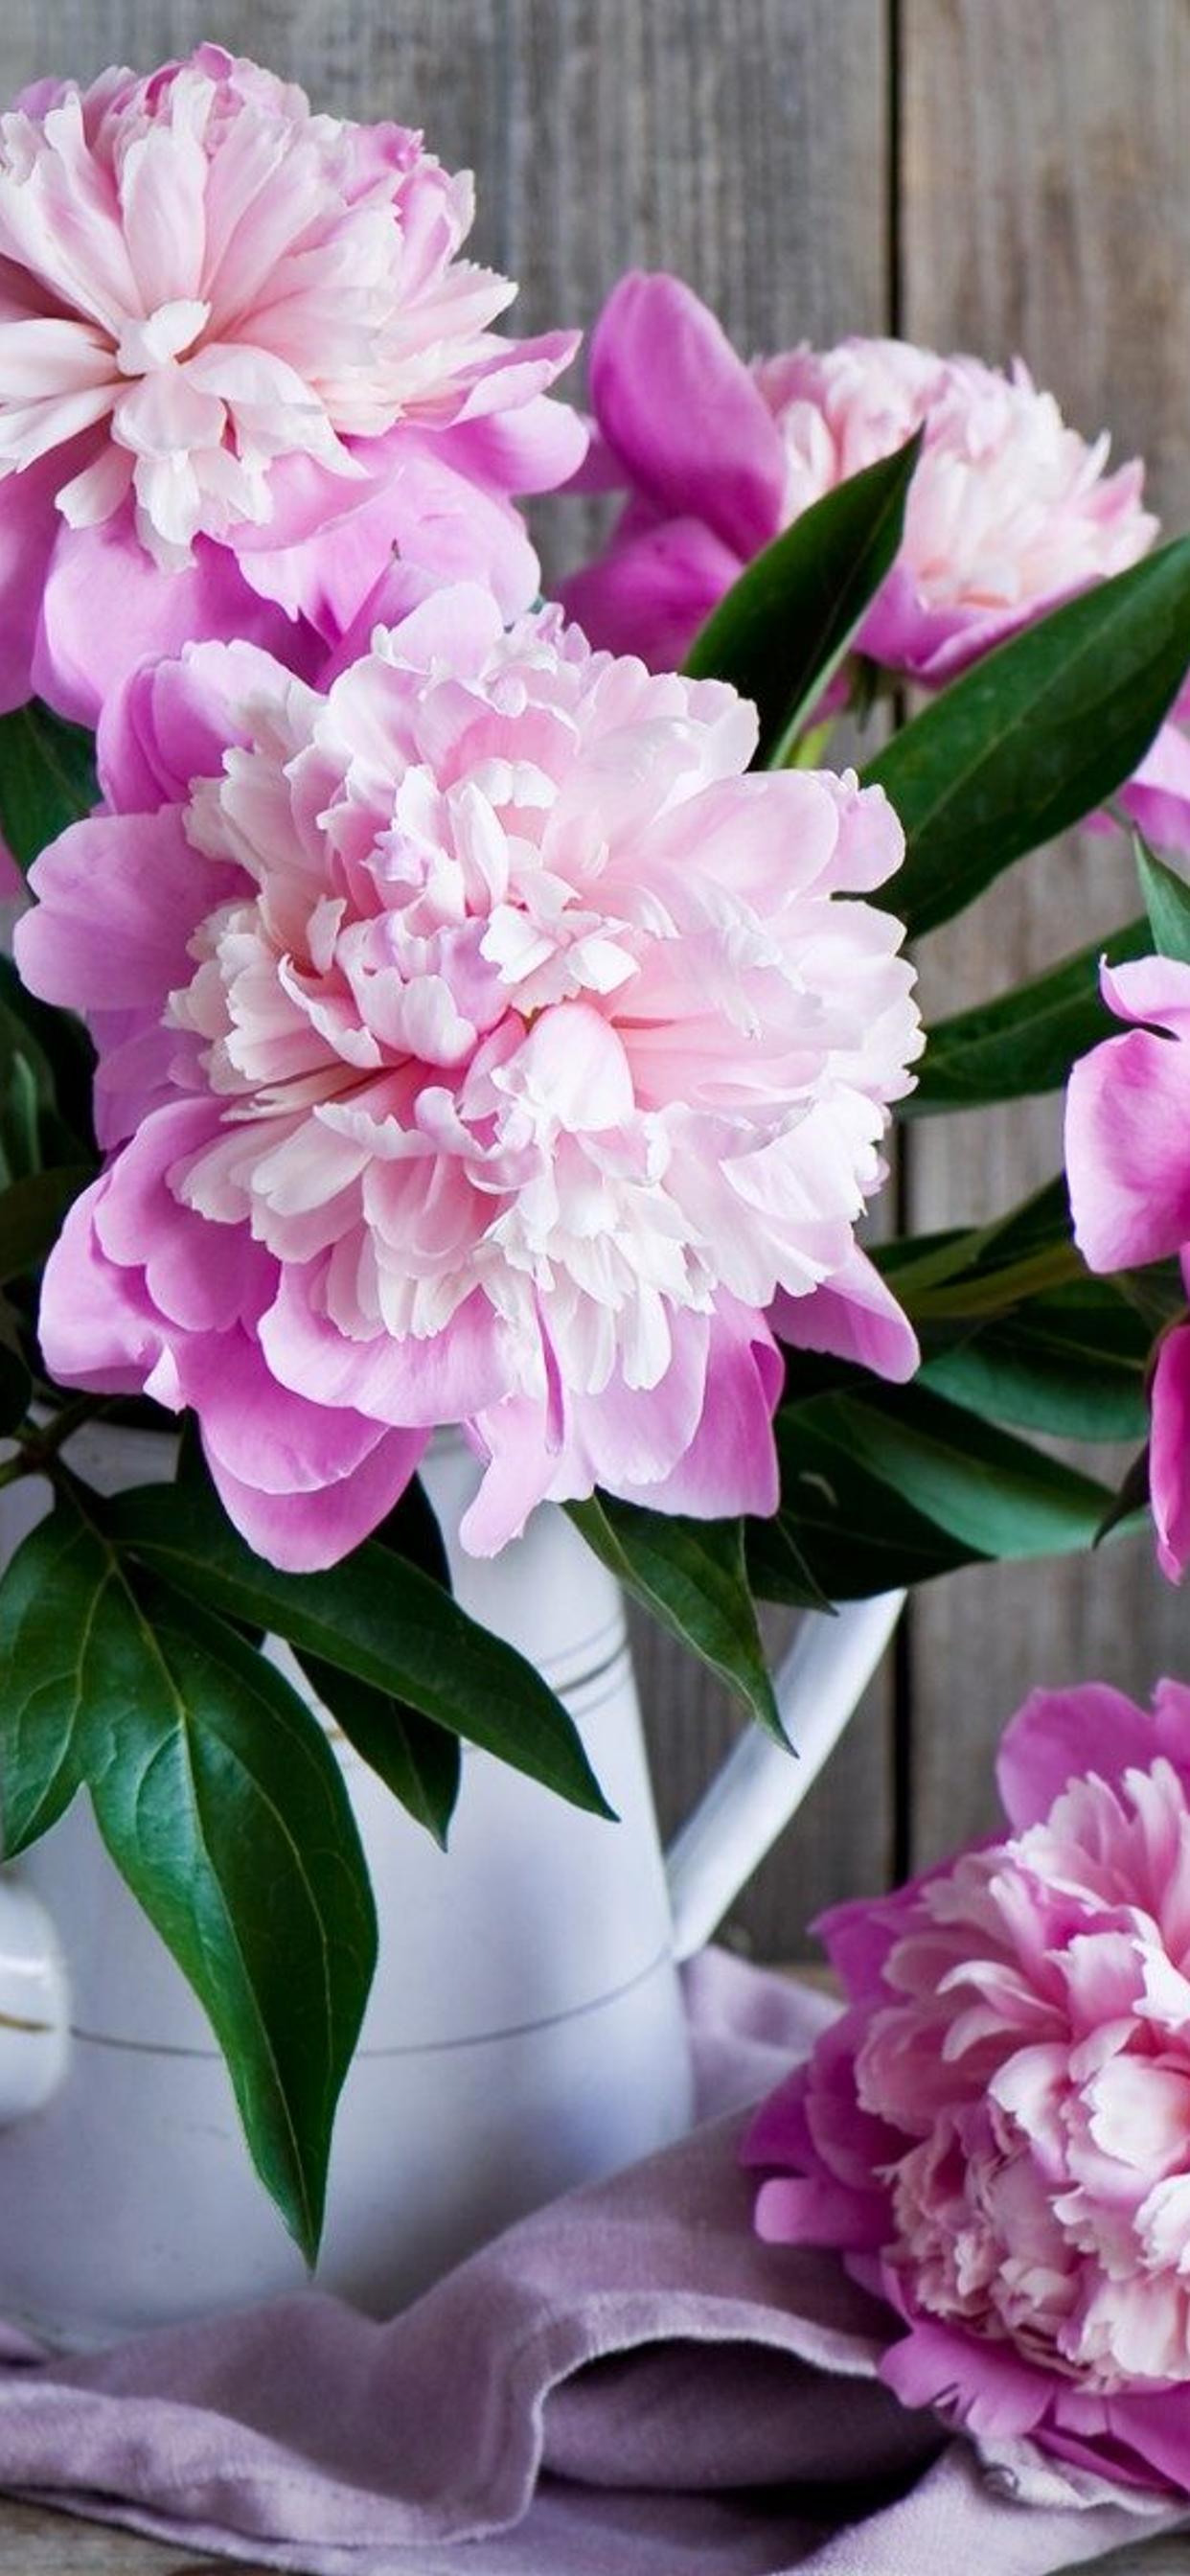 Wonderful Pink Flowers Vintage Objects On A Wallpaper